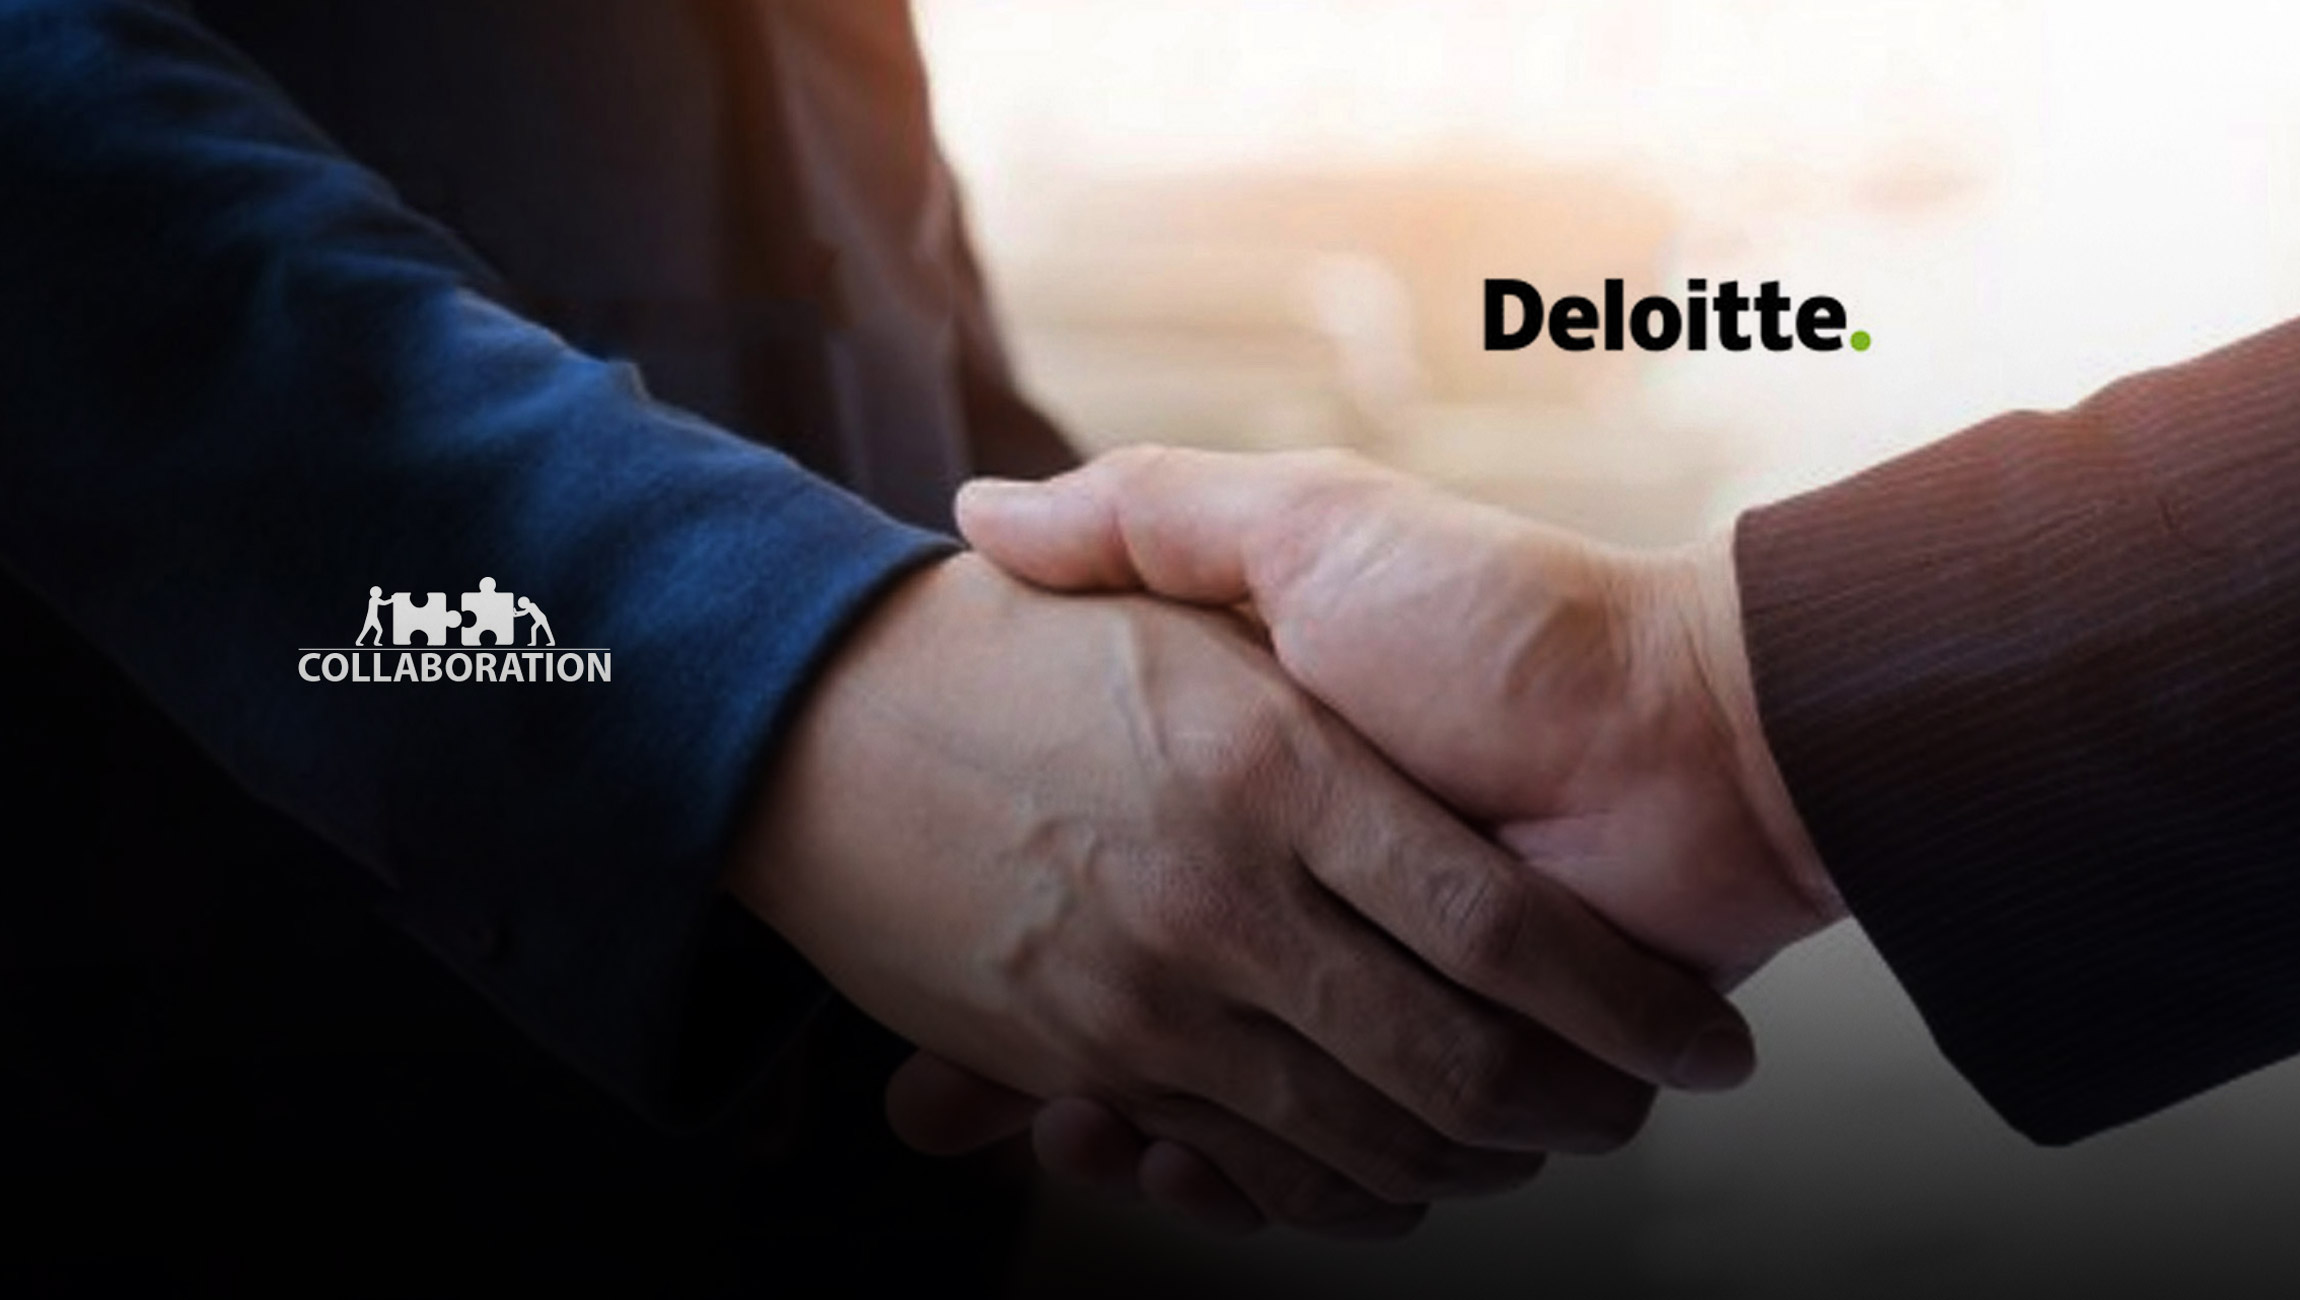 Deloitte Sets New Record in Achieving Snowflake's Elite Services Partner Status